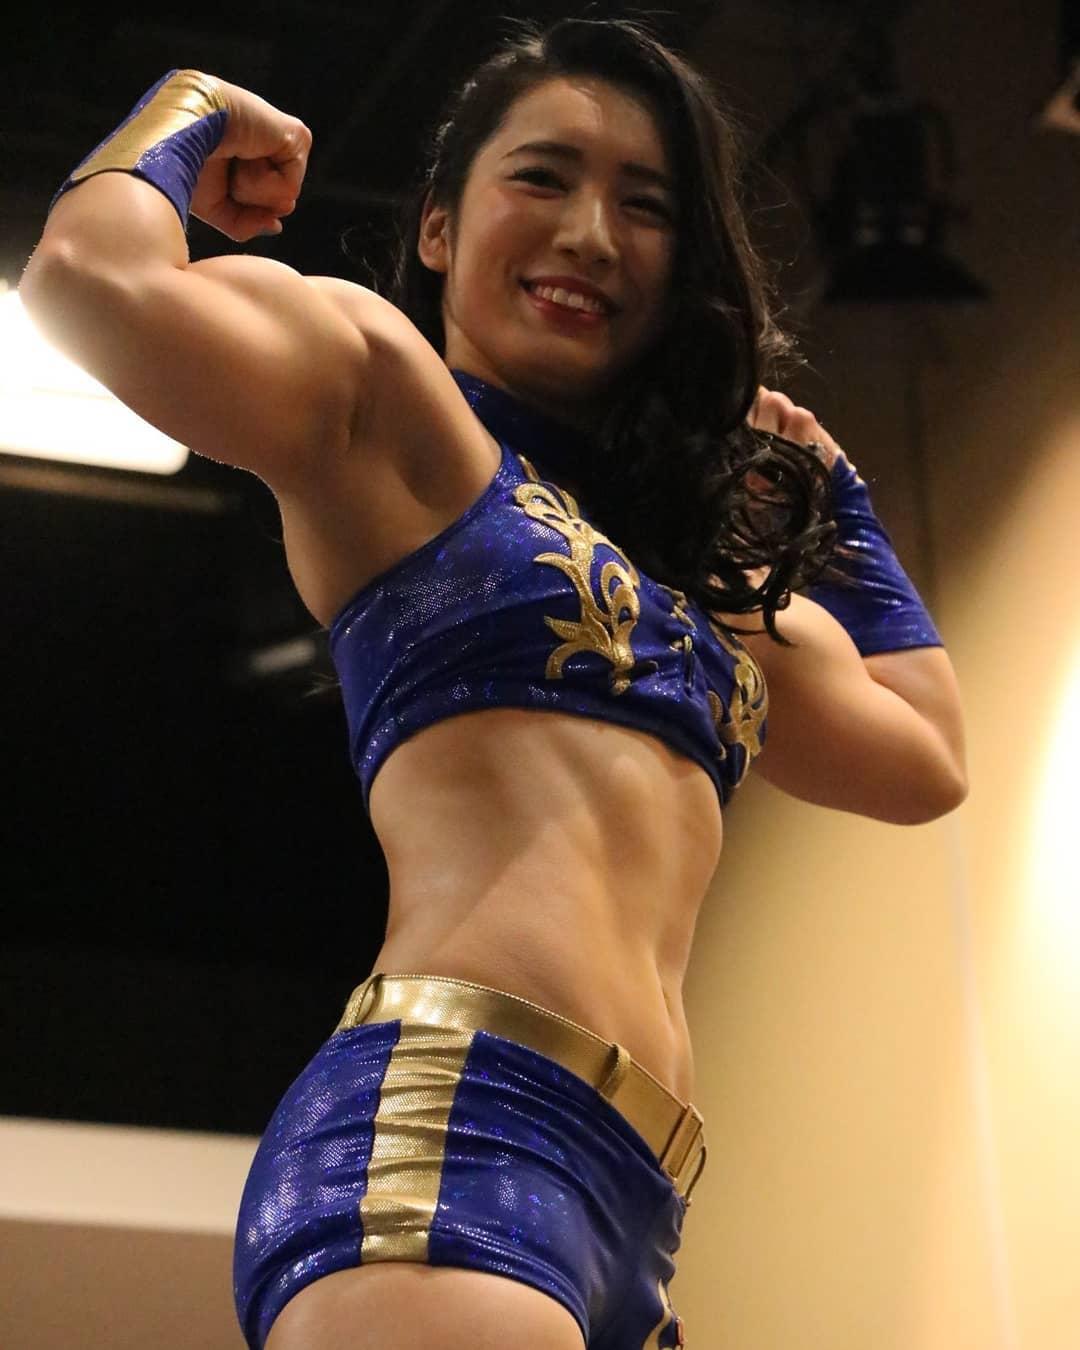 Japanese woman bodybuilding